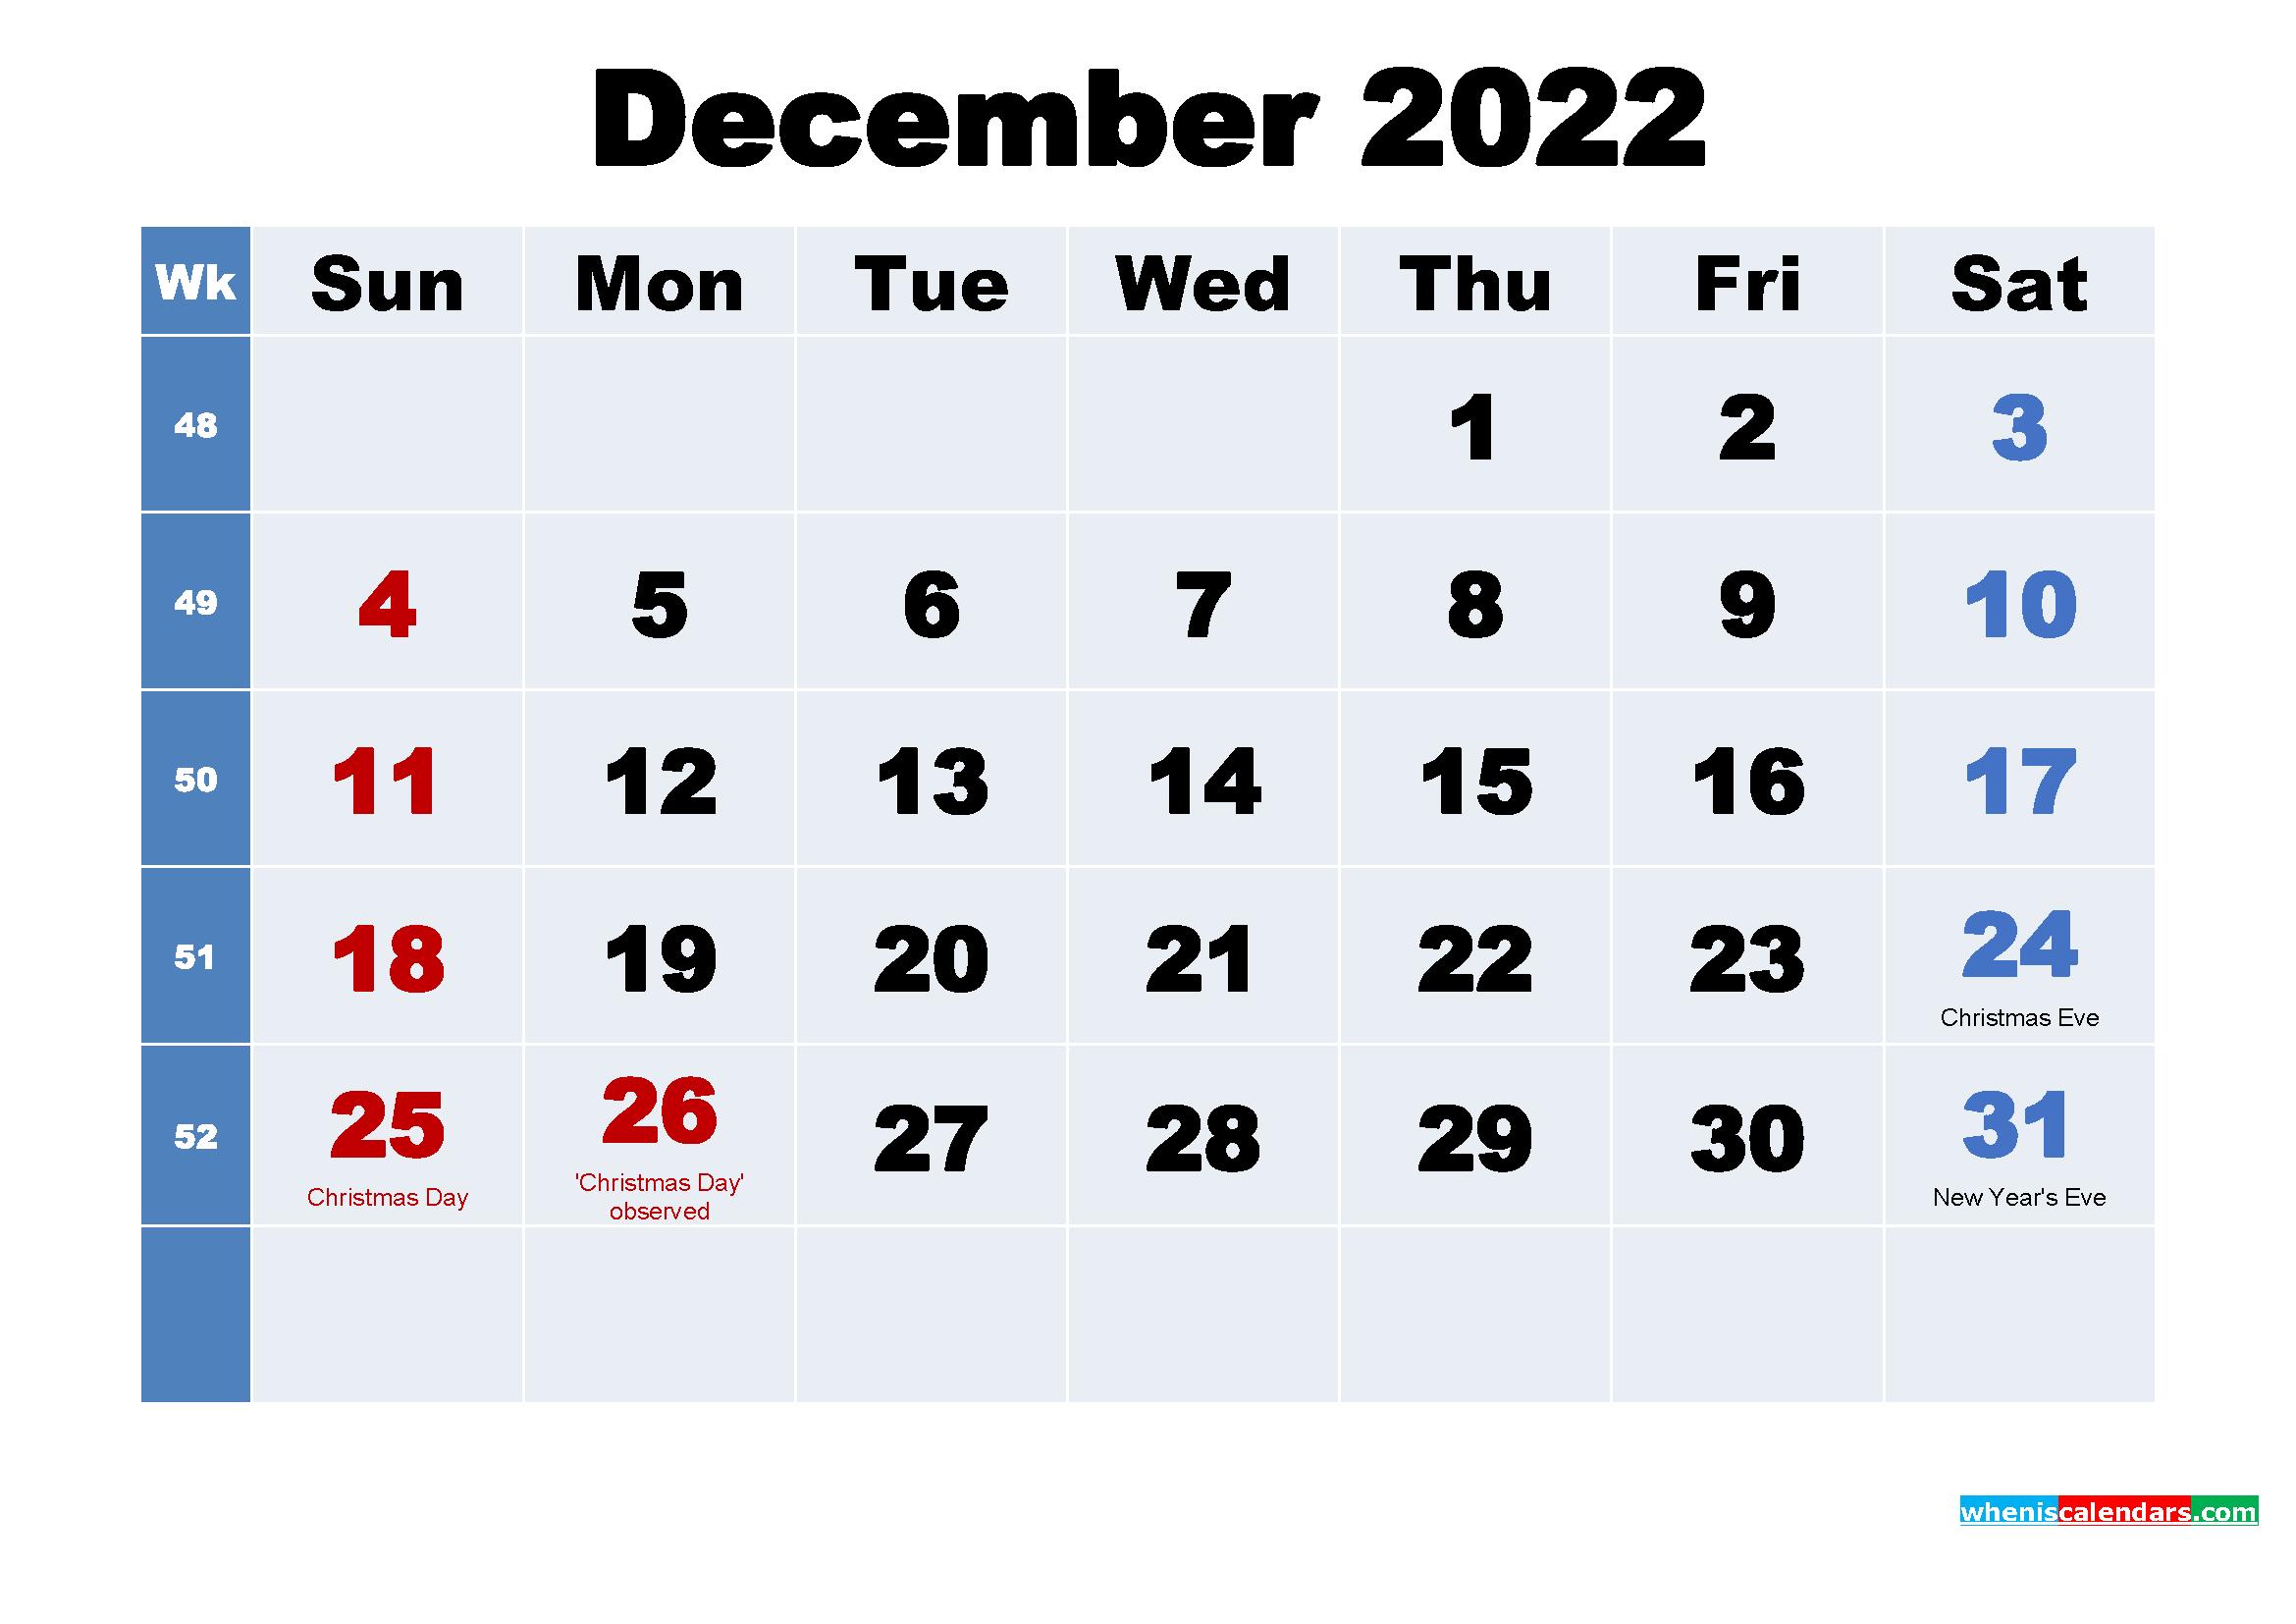 December 2022 Desktop Calendar with Holidays